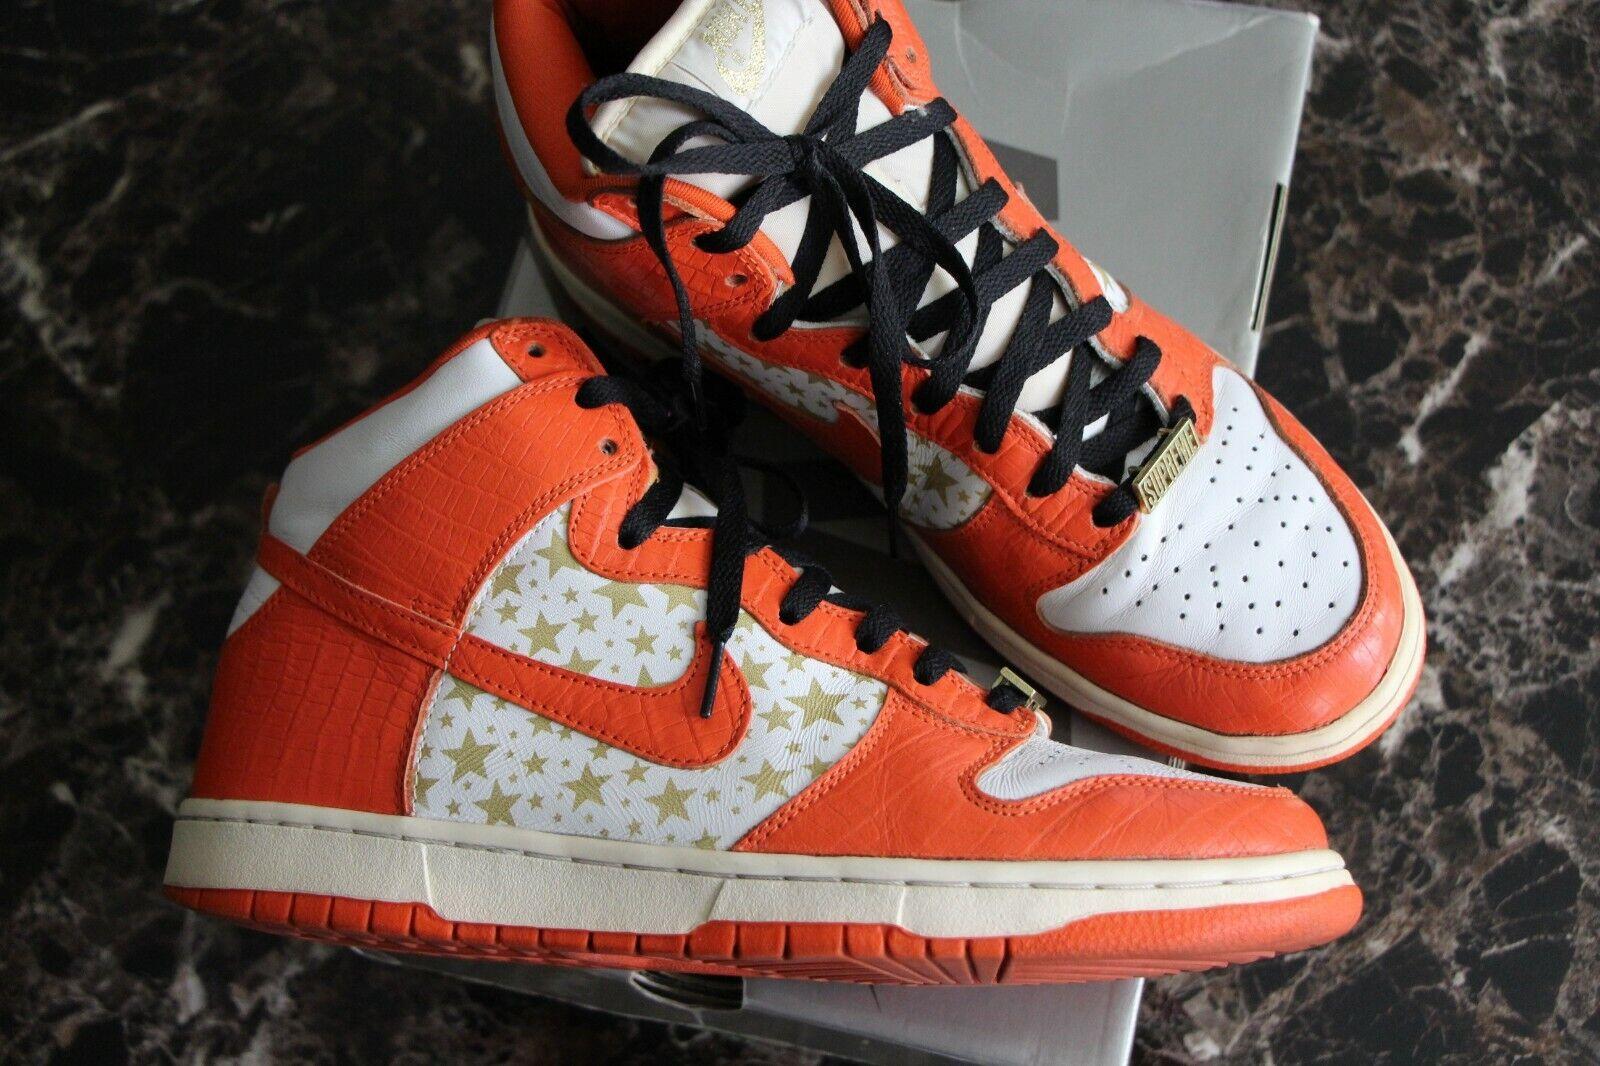 Nike Dunk High SB Pro Supreme orange Star Men's 10.5 Jordan Cement 307385 181